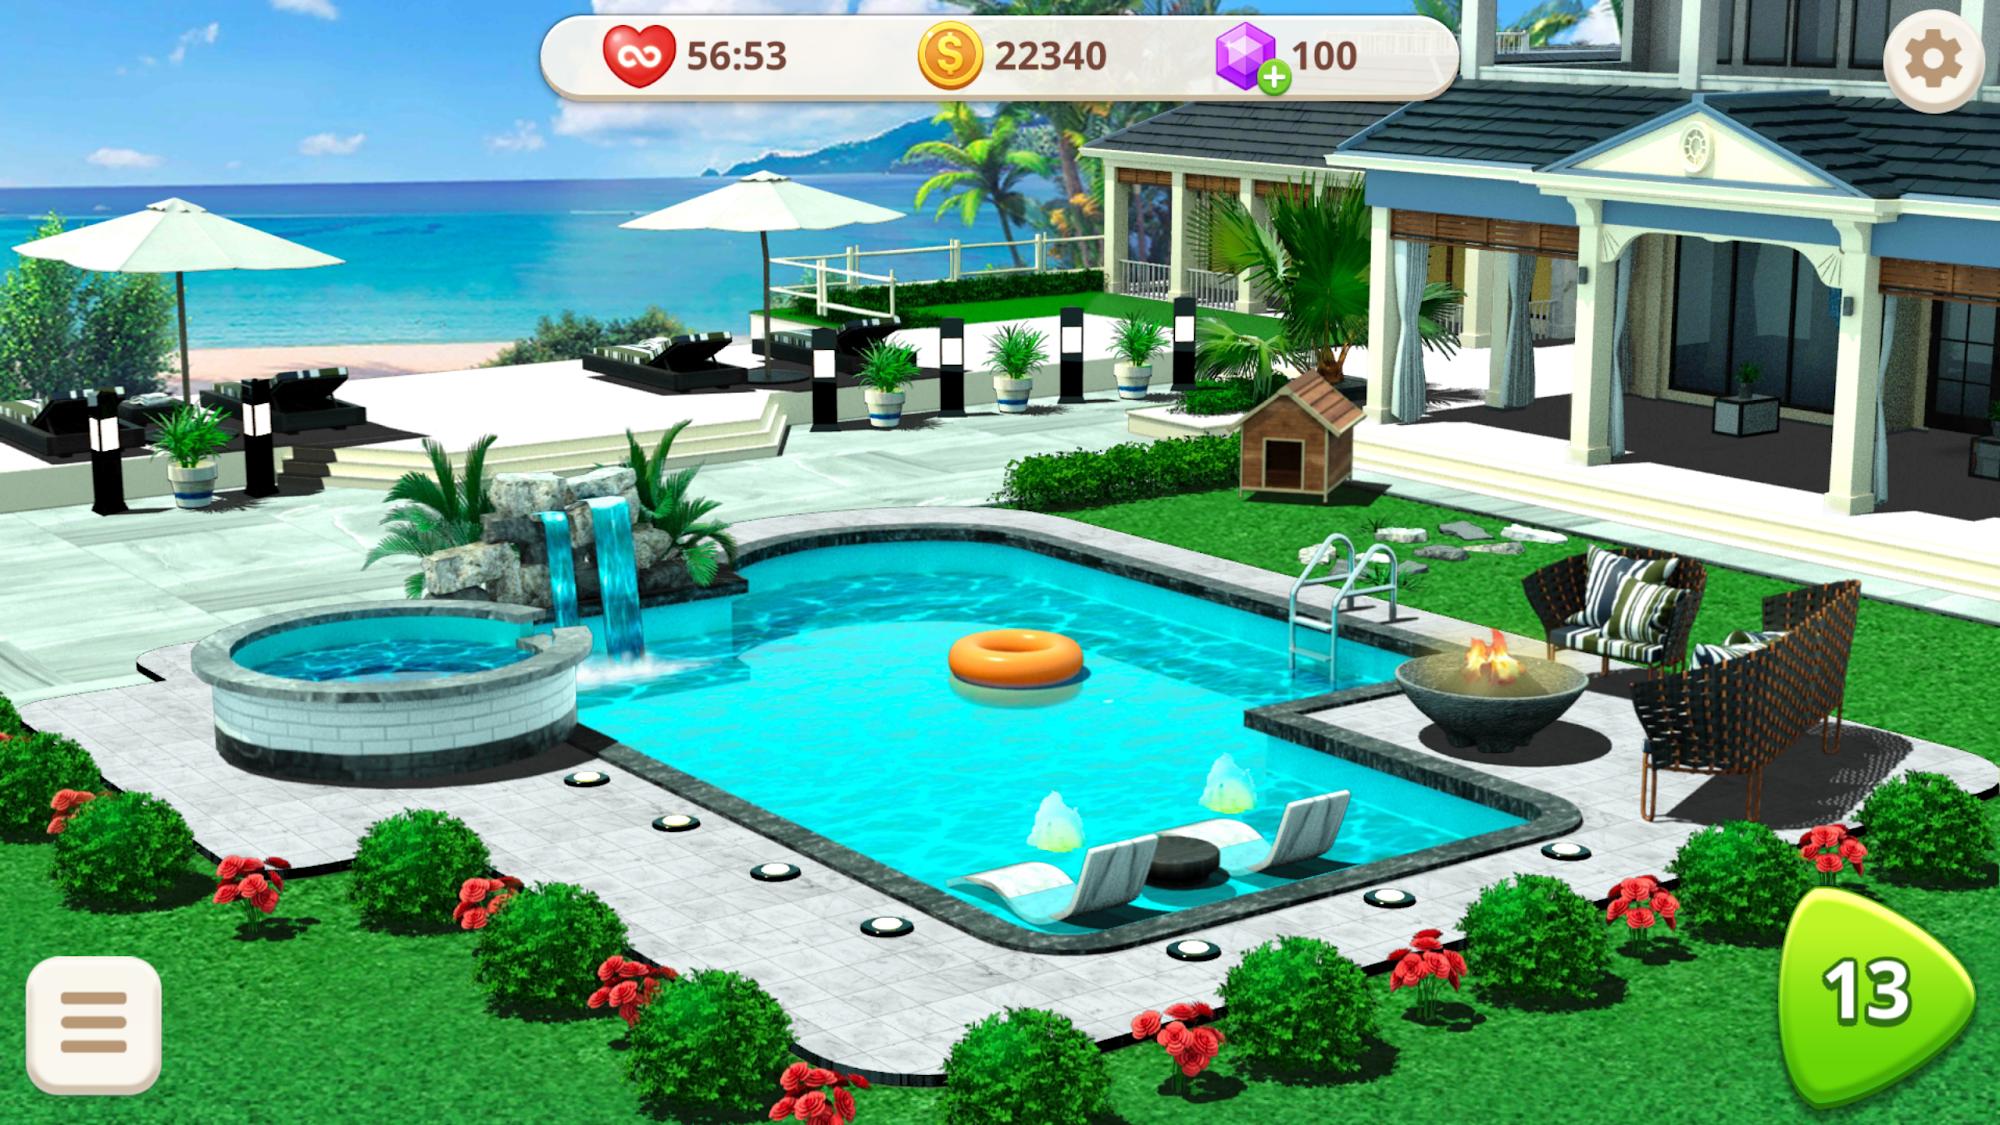 Home Design : Caribbean Life captura de pantalla 1